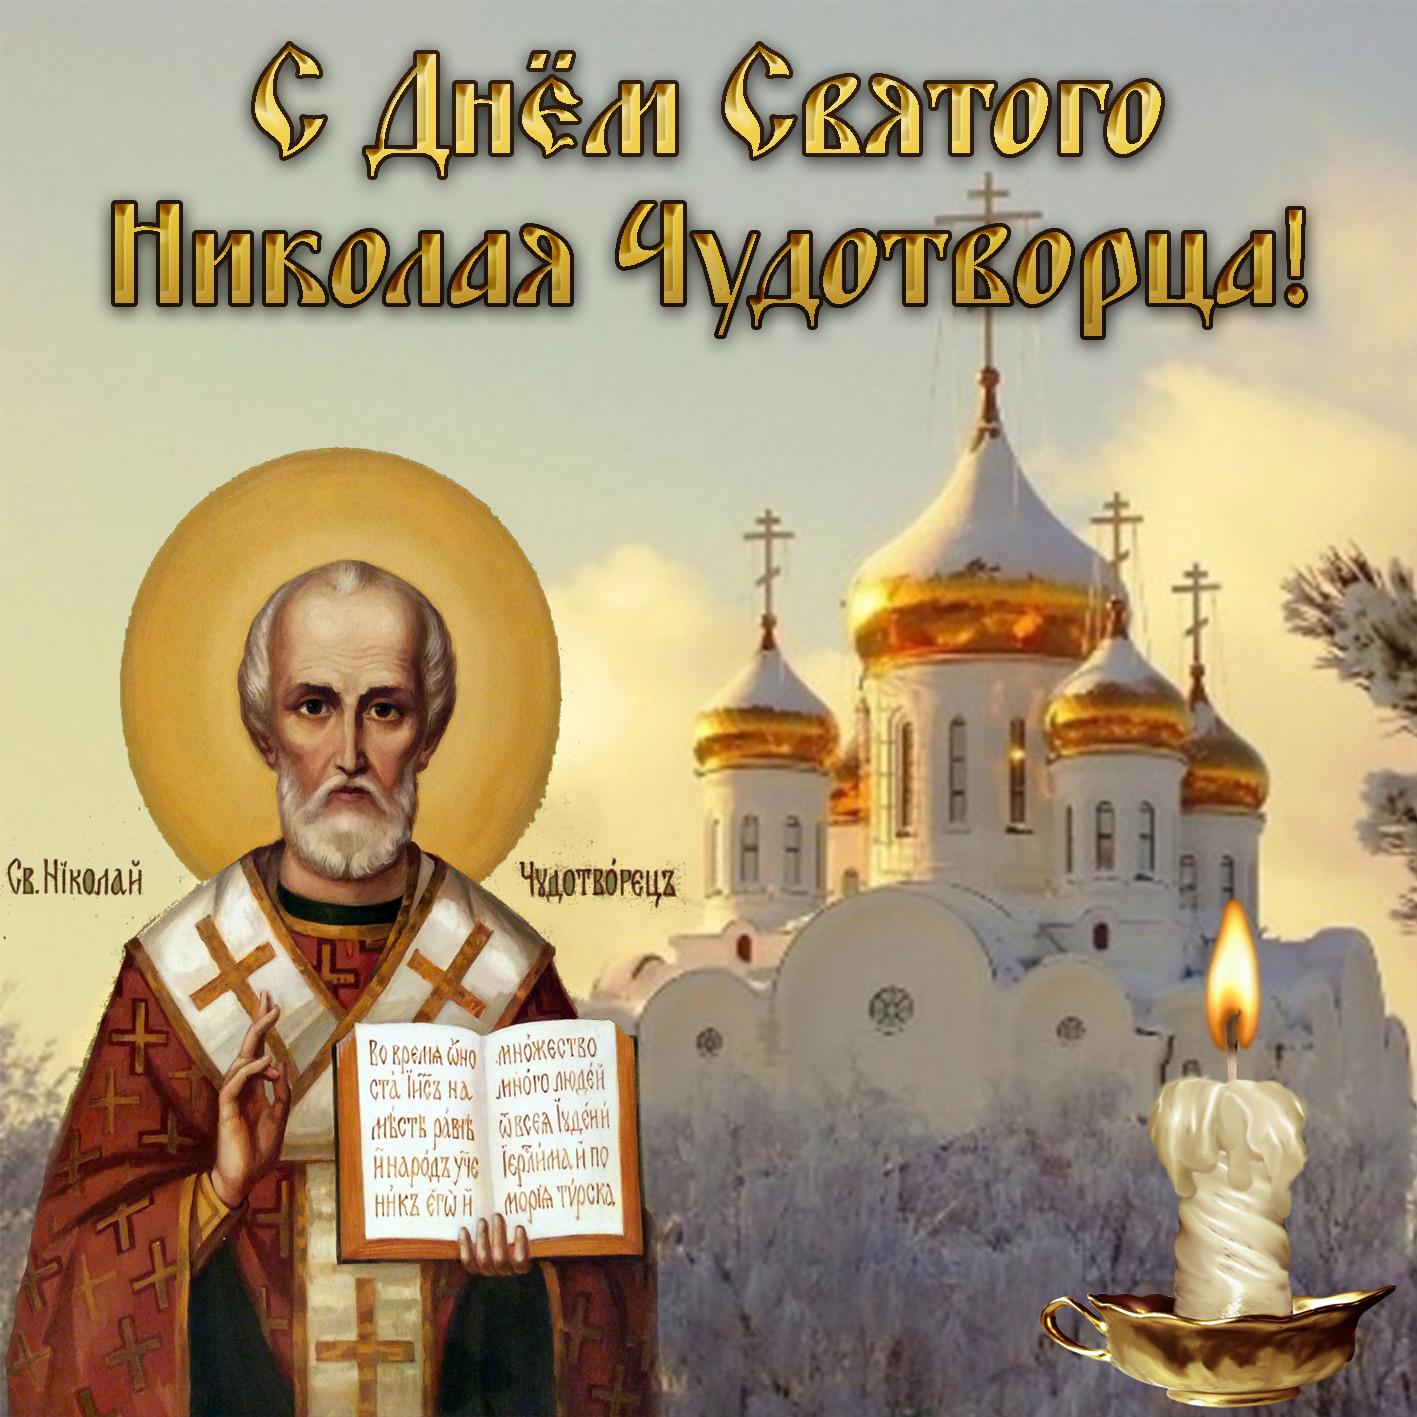 Картинки открытки с днем святого николая чудотворца